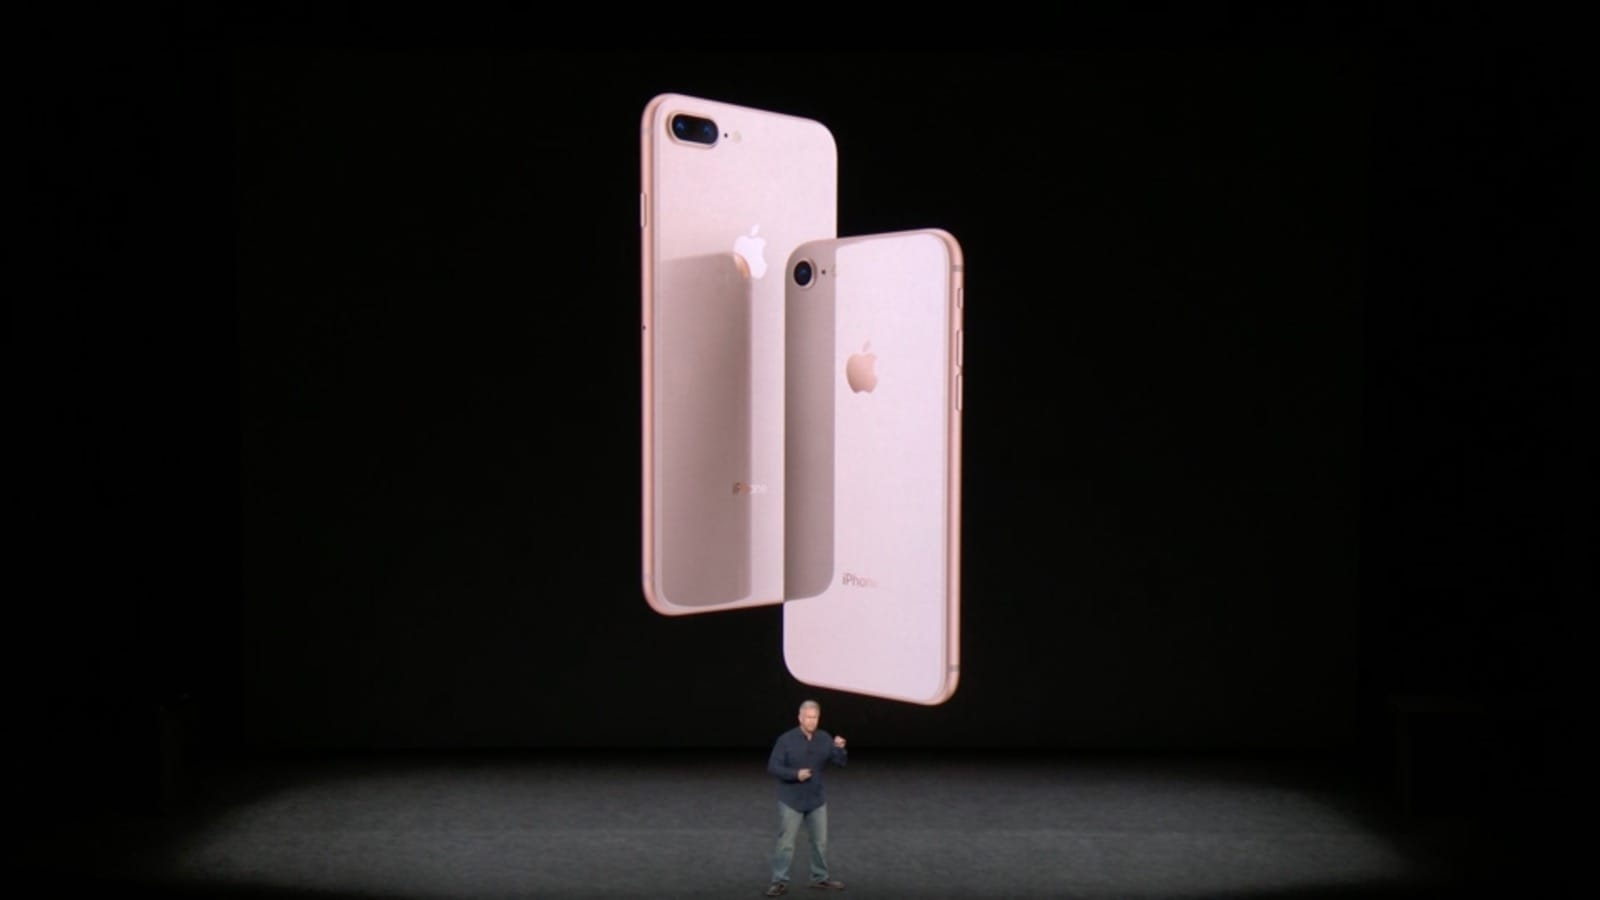 latest iPhones